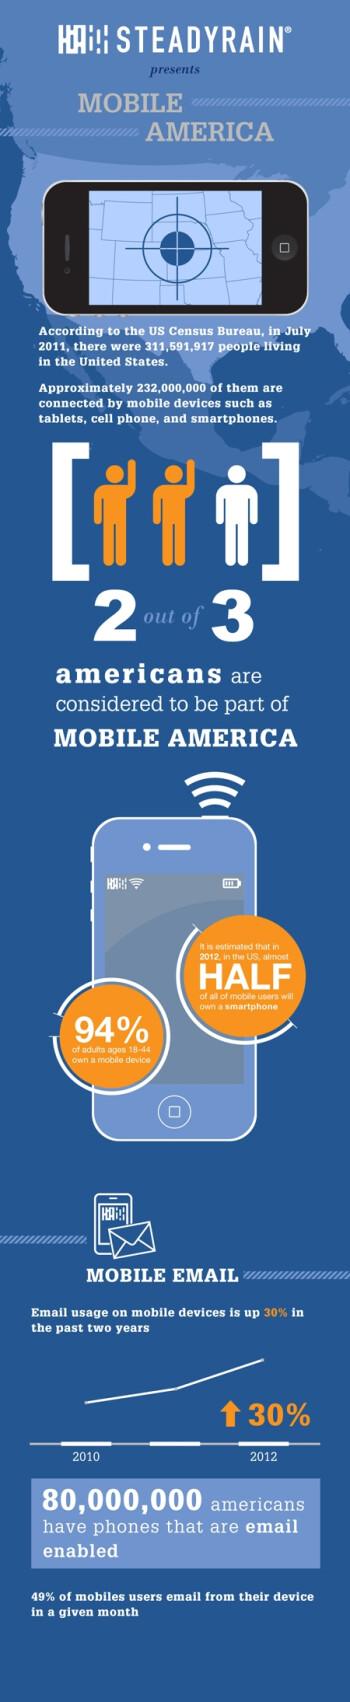 Mobile America infographic illustrates the U.S. consumer's wireless habits